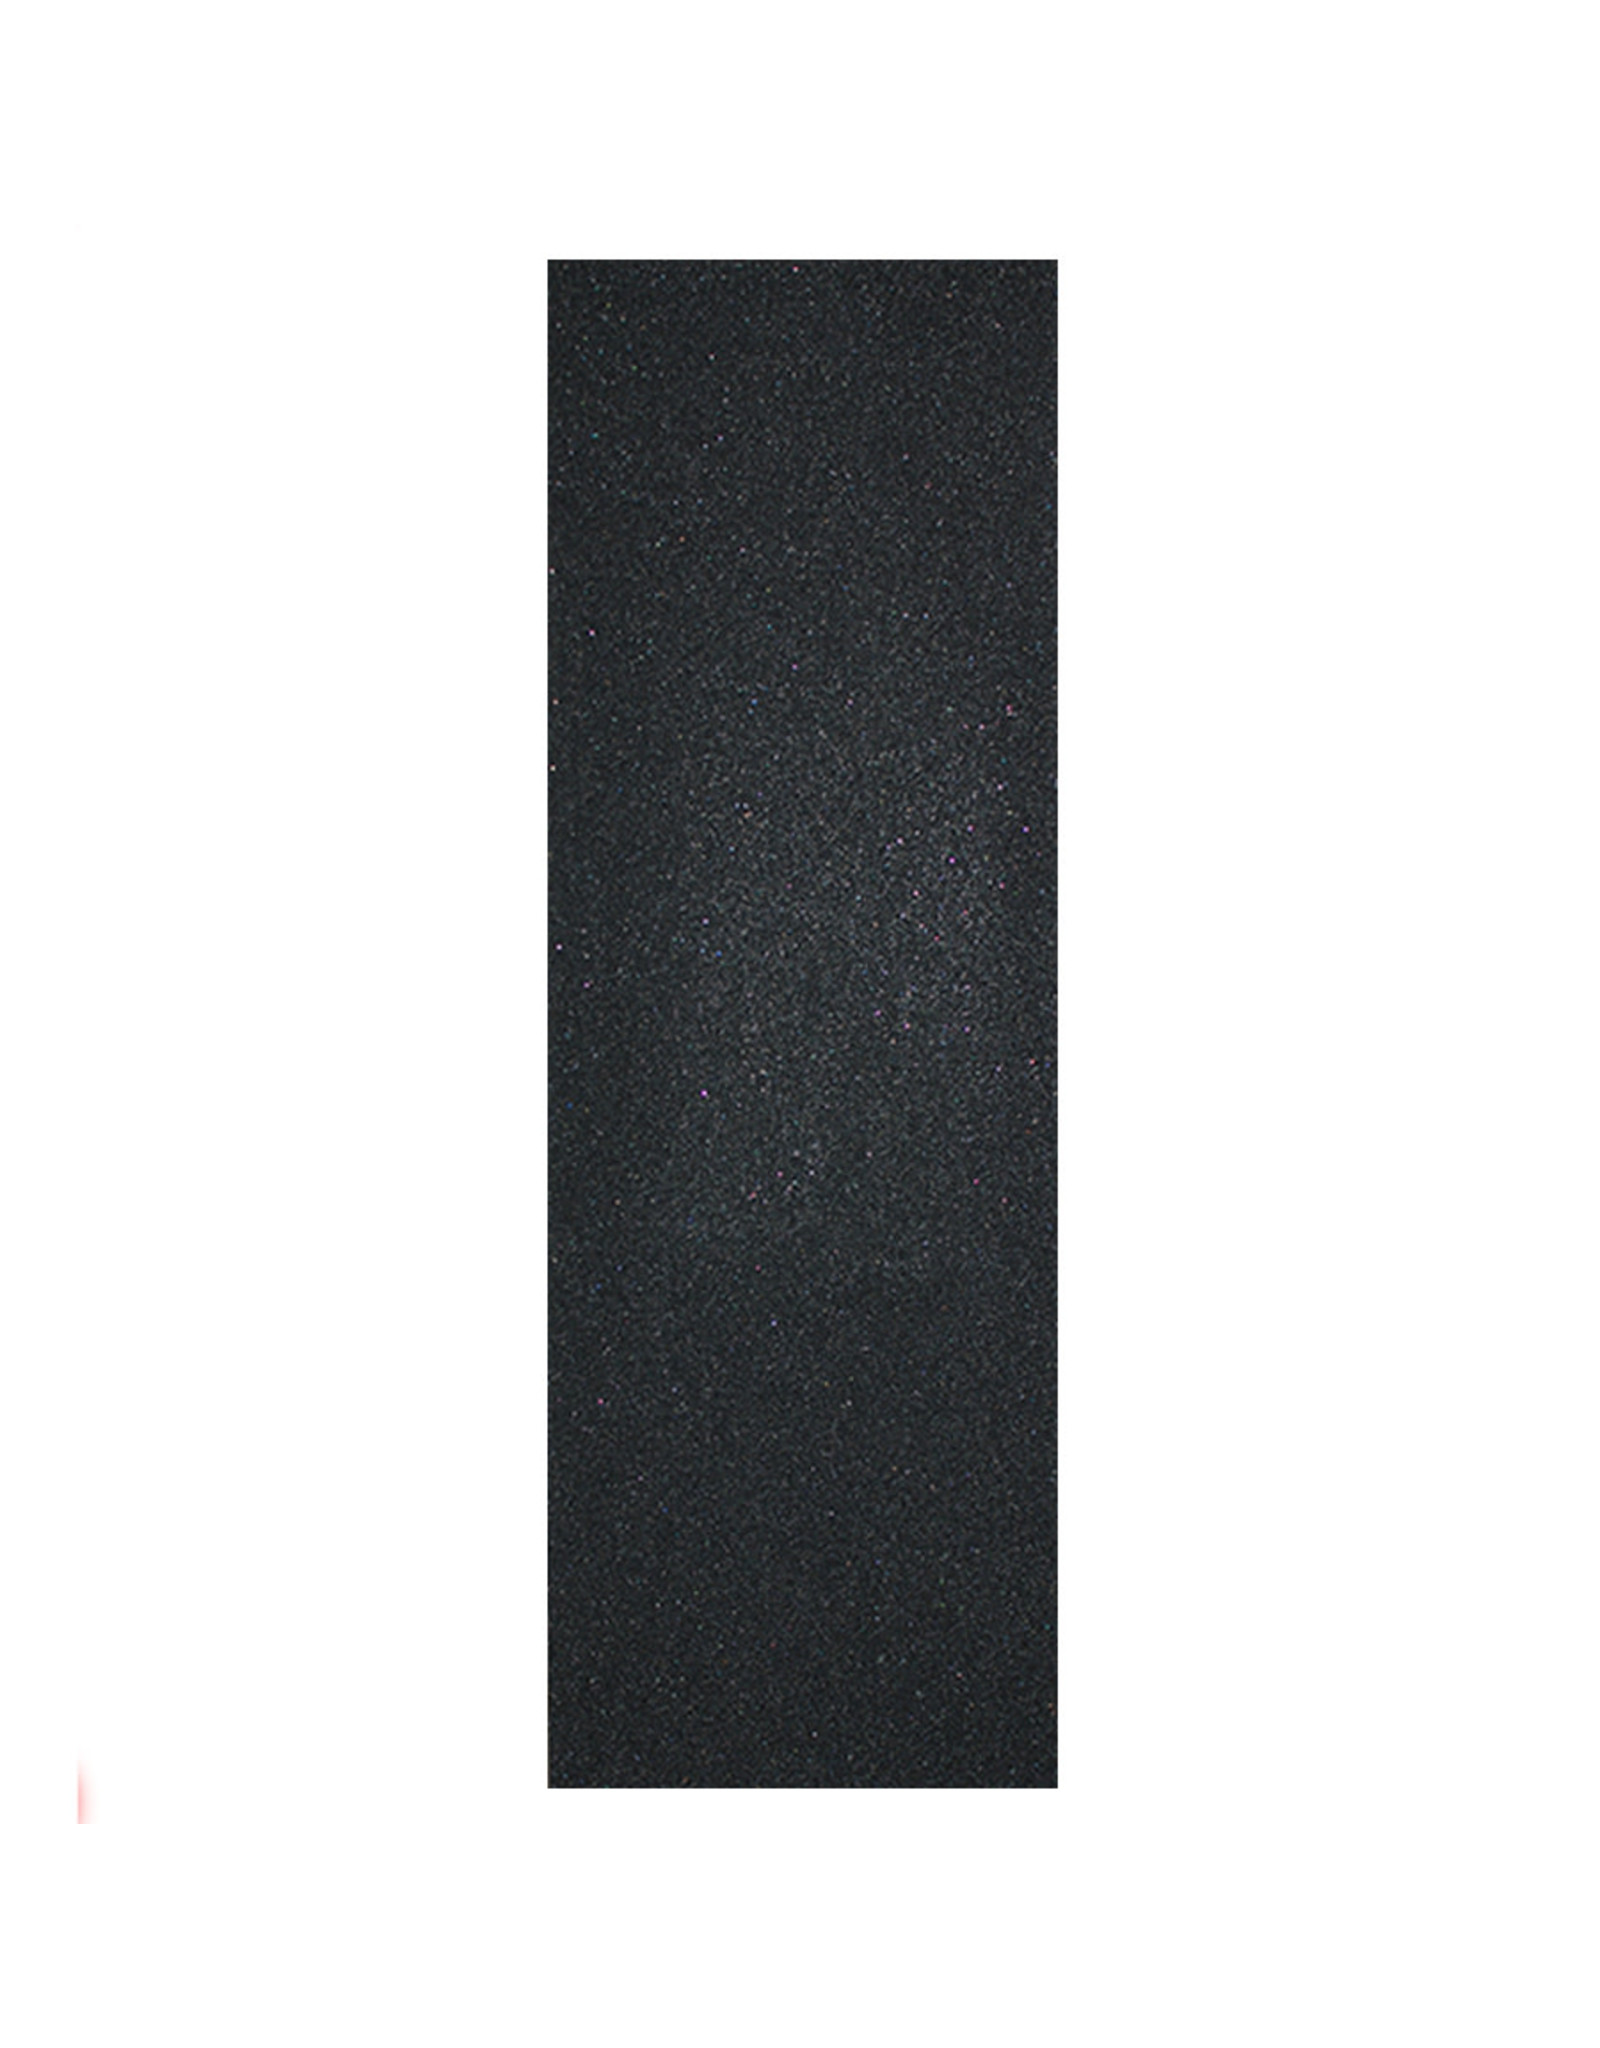 Flik Grip Tape (Black)